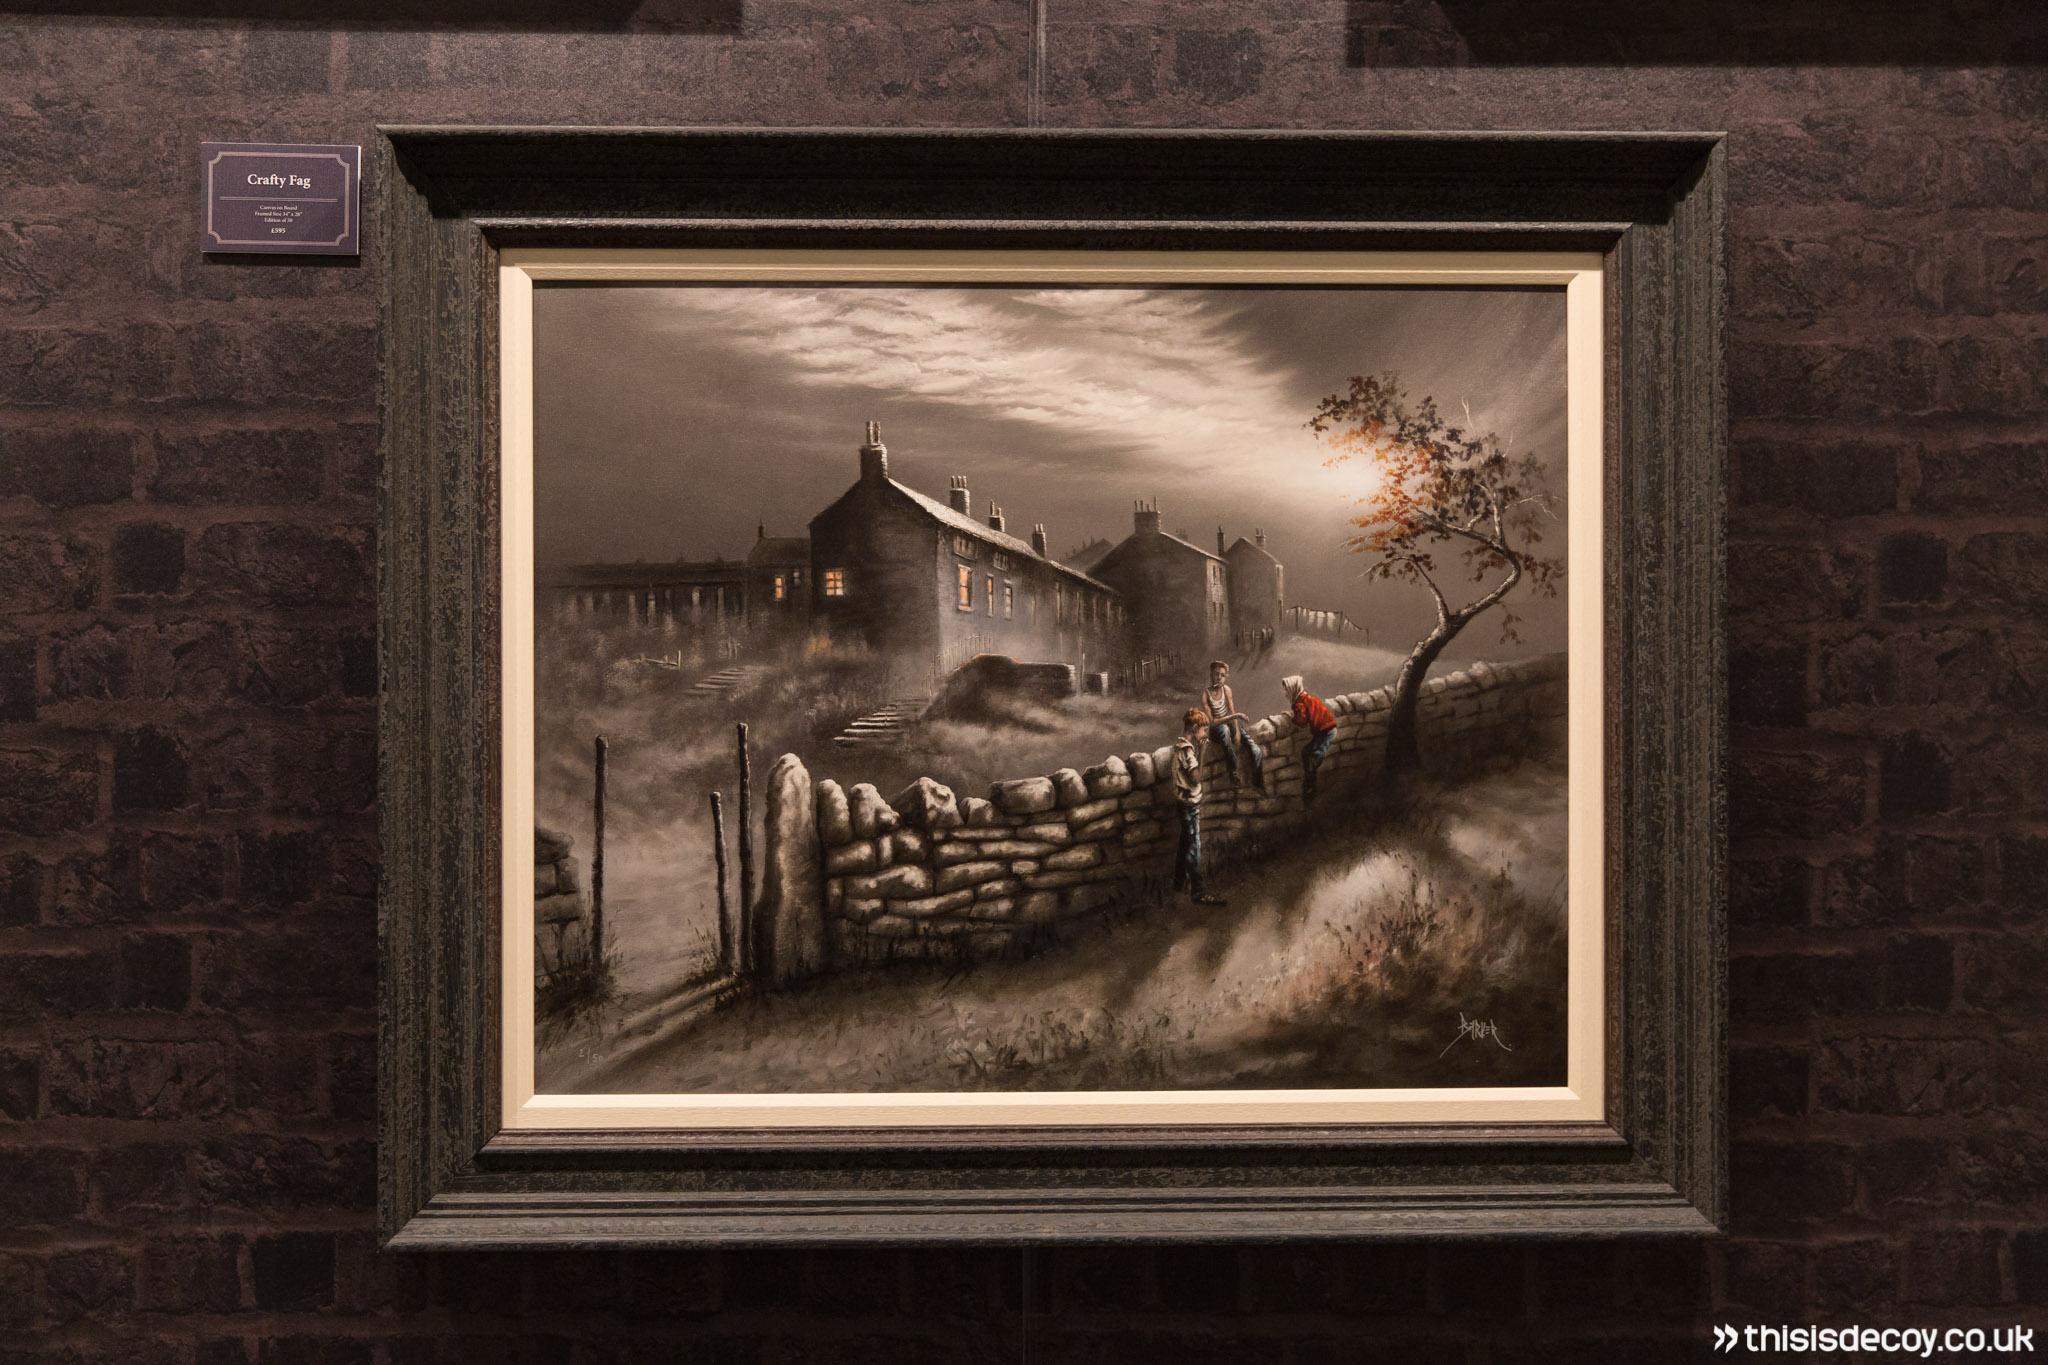 Northern Light - Bob Barker - Leeds City Museum - 20 Jan 17 - Decoy Media - 4.jpg